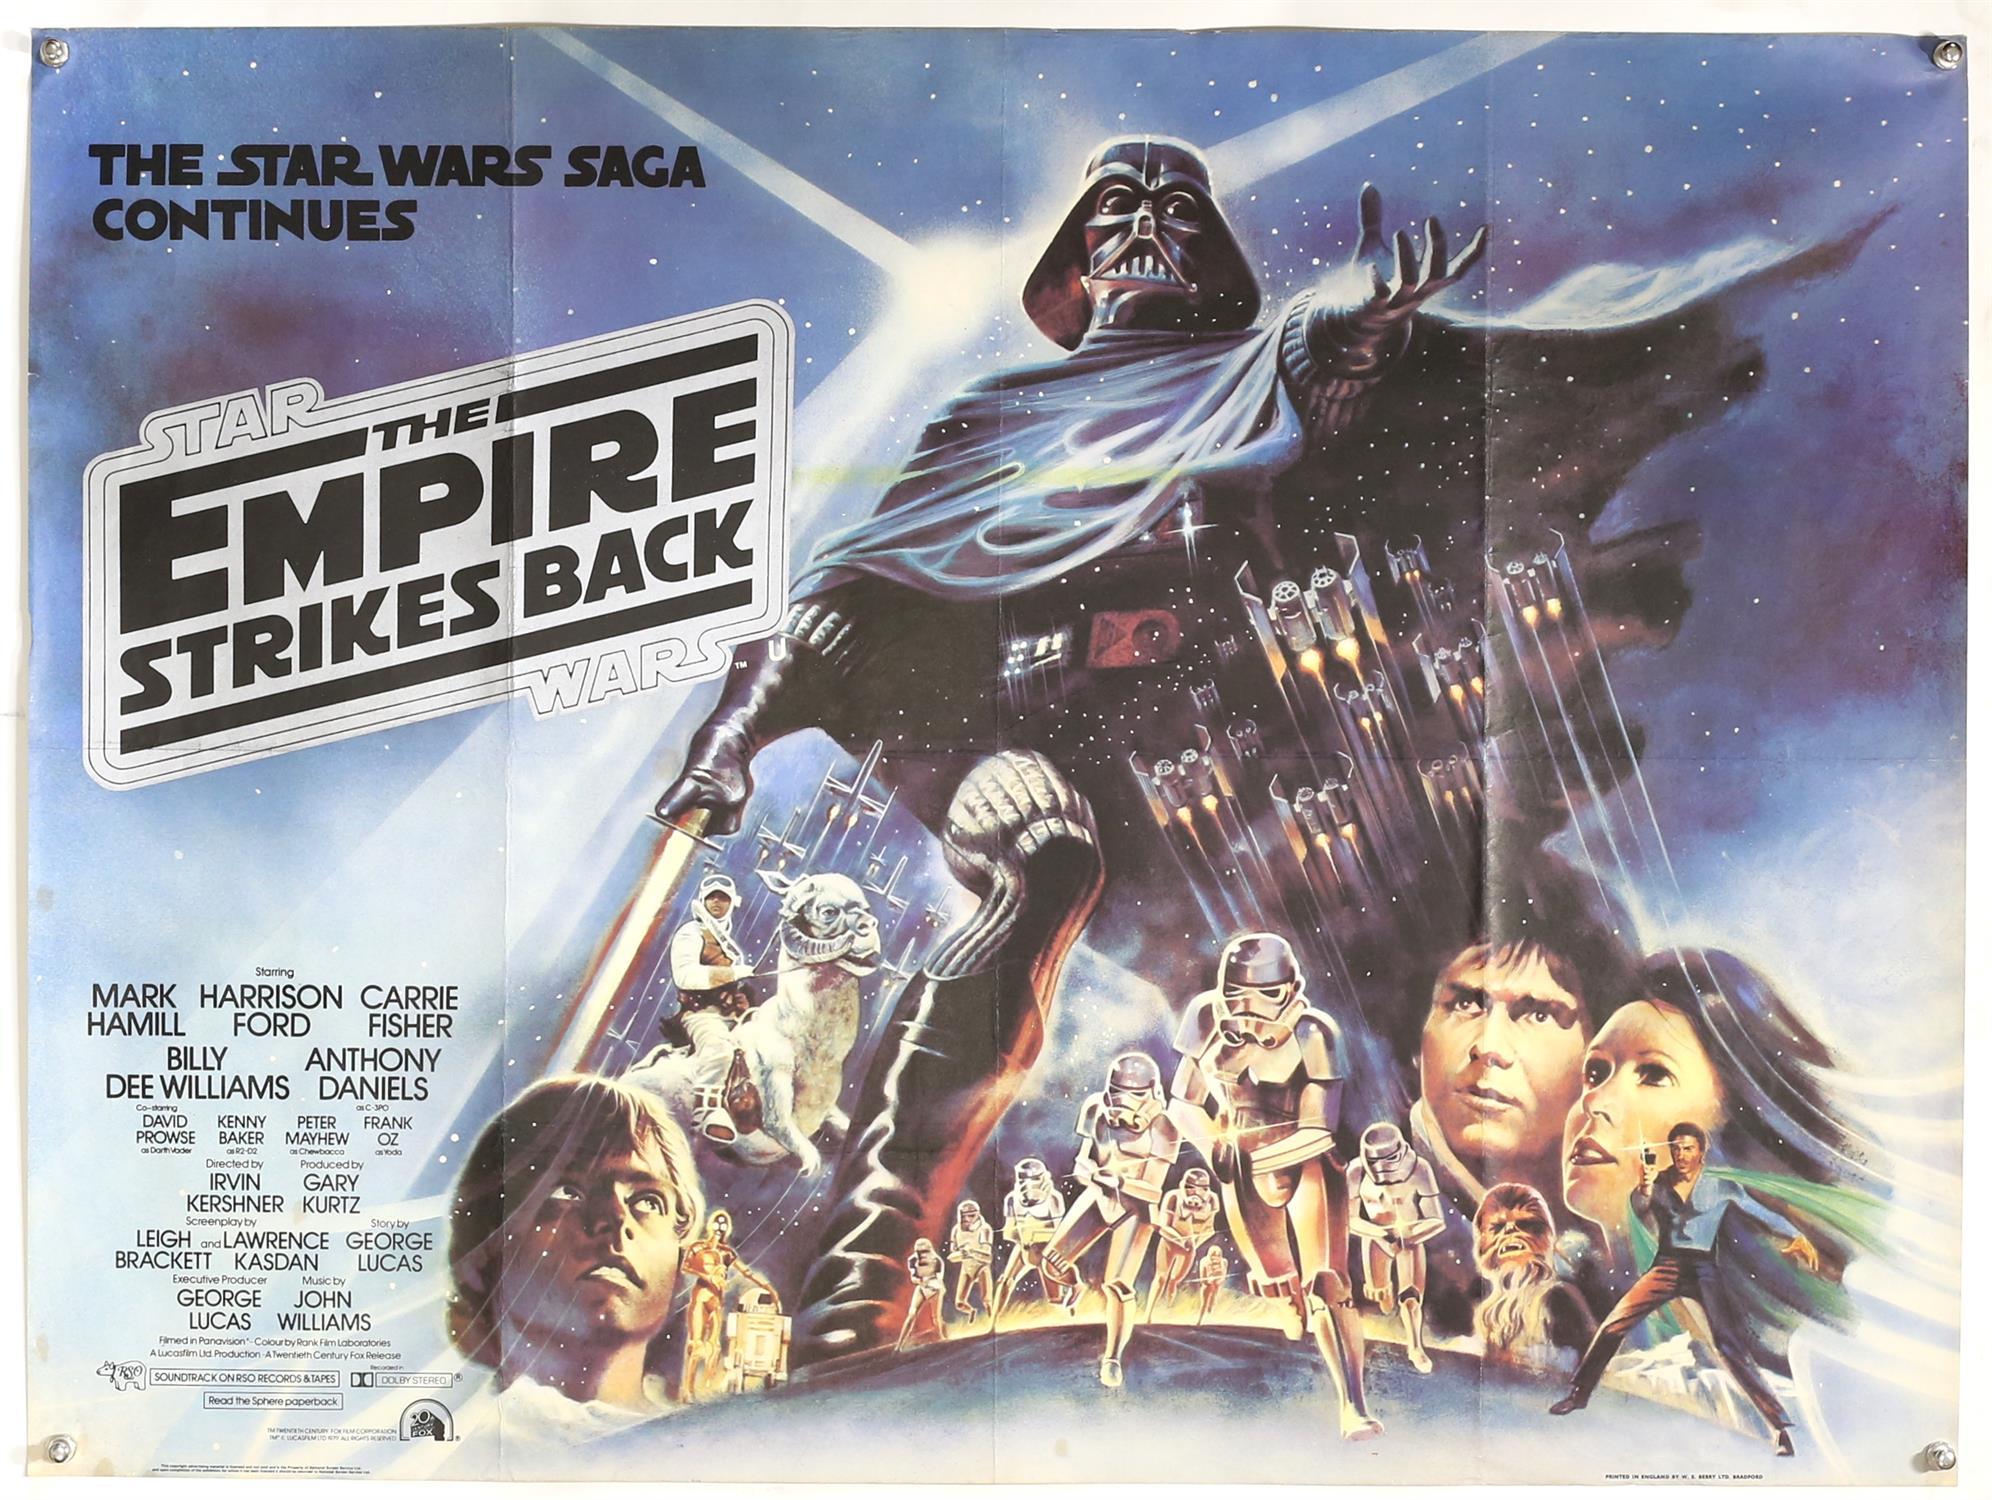 Star Wars The Empire Strikes Back (1980) British Quad film poster, artwork by Drew Struzan, folded,